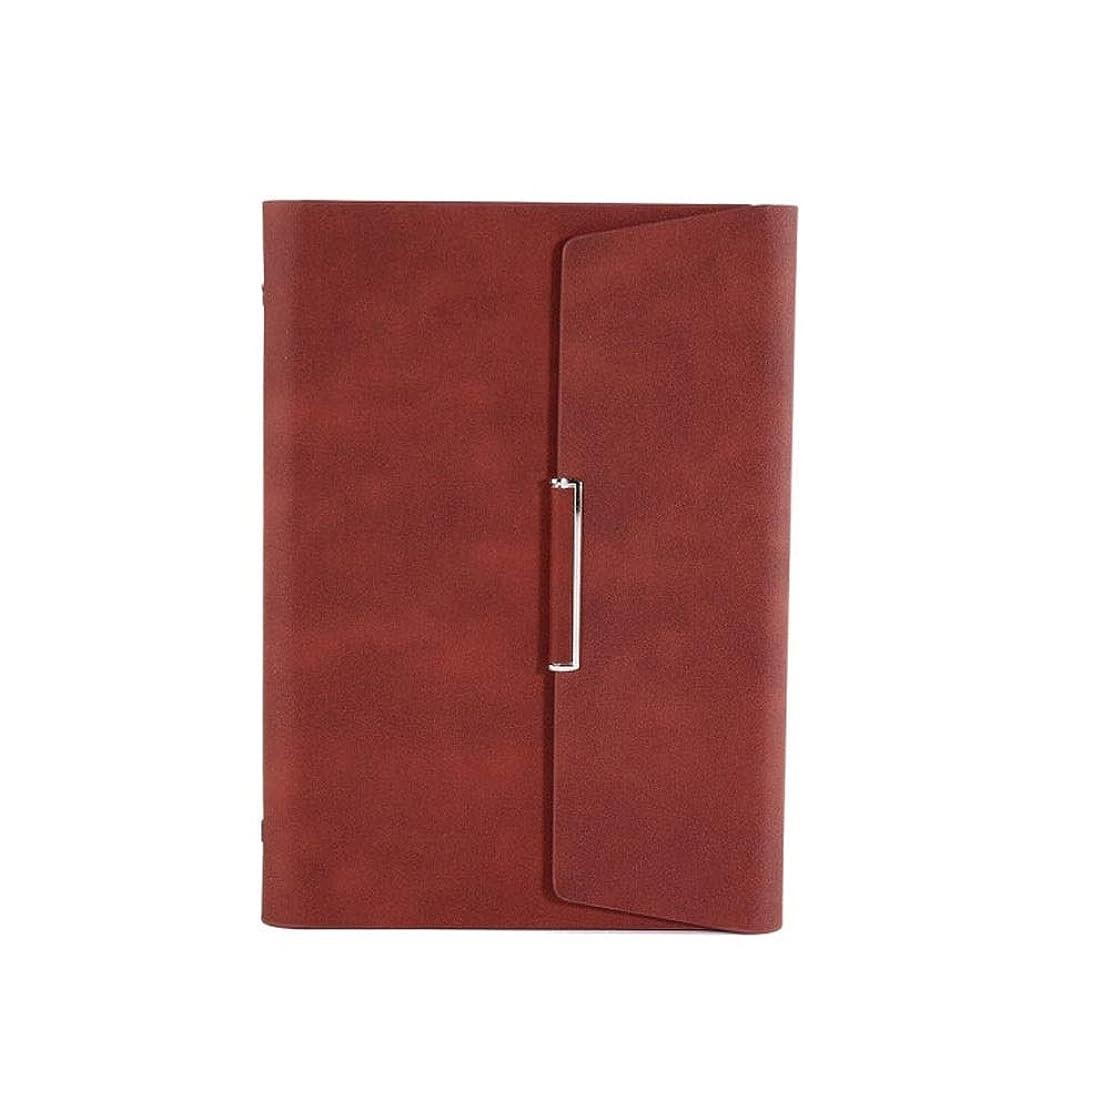 A5ルーズリーフノート、多機能ビジネスノート、作業ログ6穴ルーズリーフコア効率マニュアル、シンプルな日記、グレー/ブラウン/オレンジ/ブルー/ブラック、高品質 (Color : Brown)